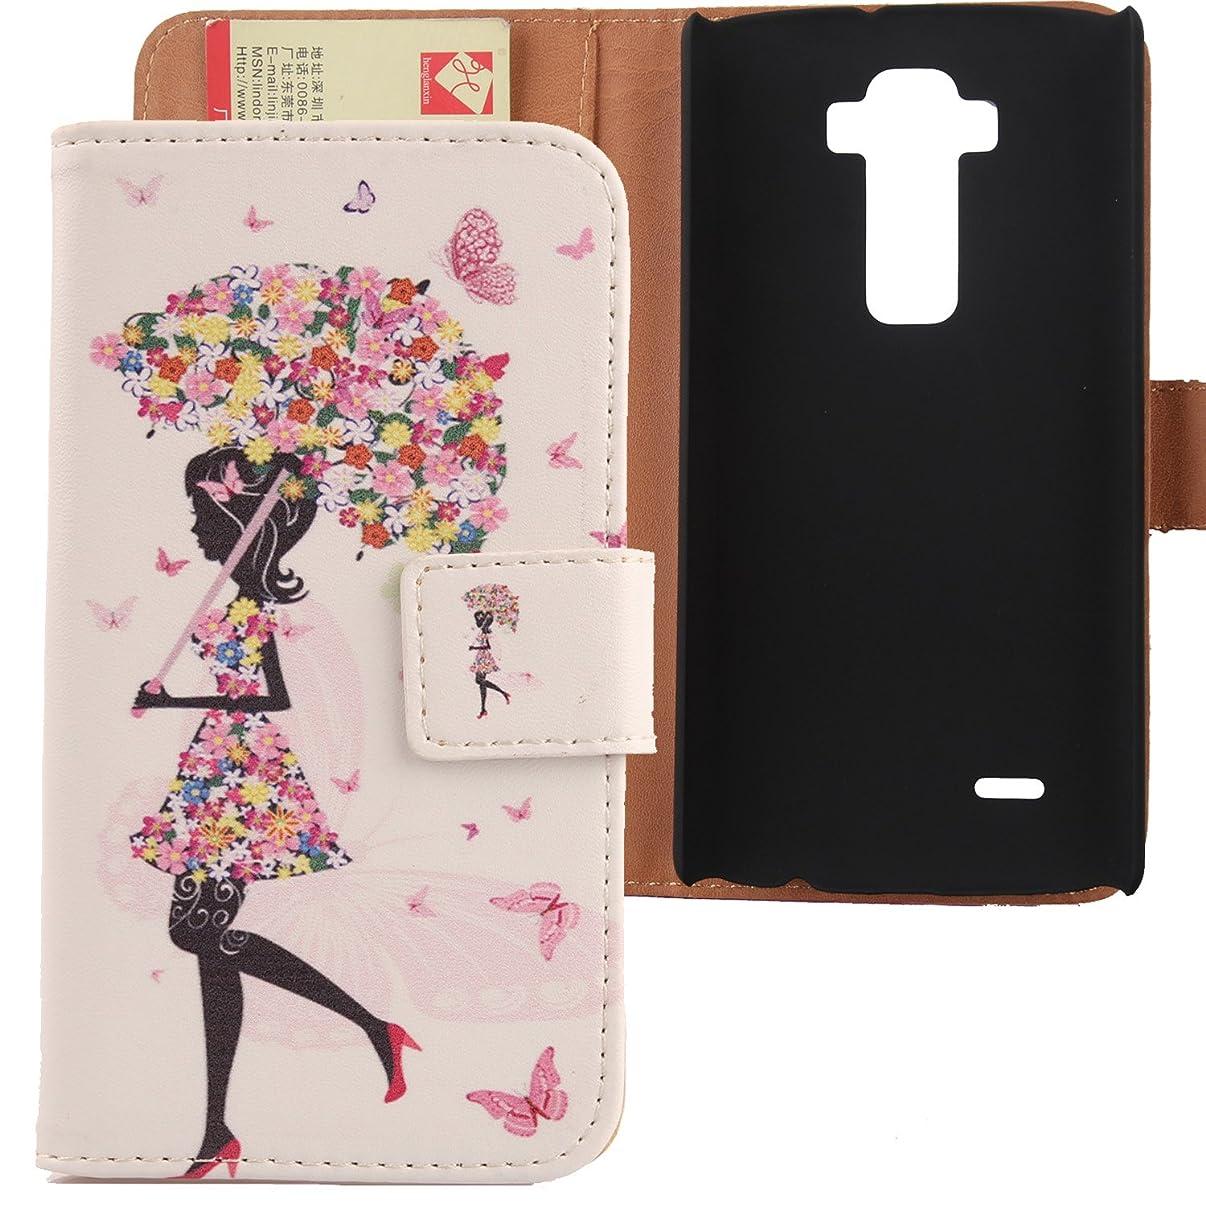 Lankashi Pattern Design Leather Cover Skin Protection Case for LG G Flex 2 F510 H959 5.5